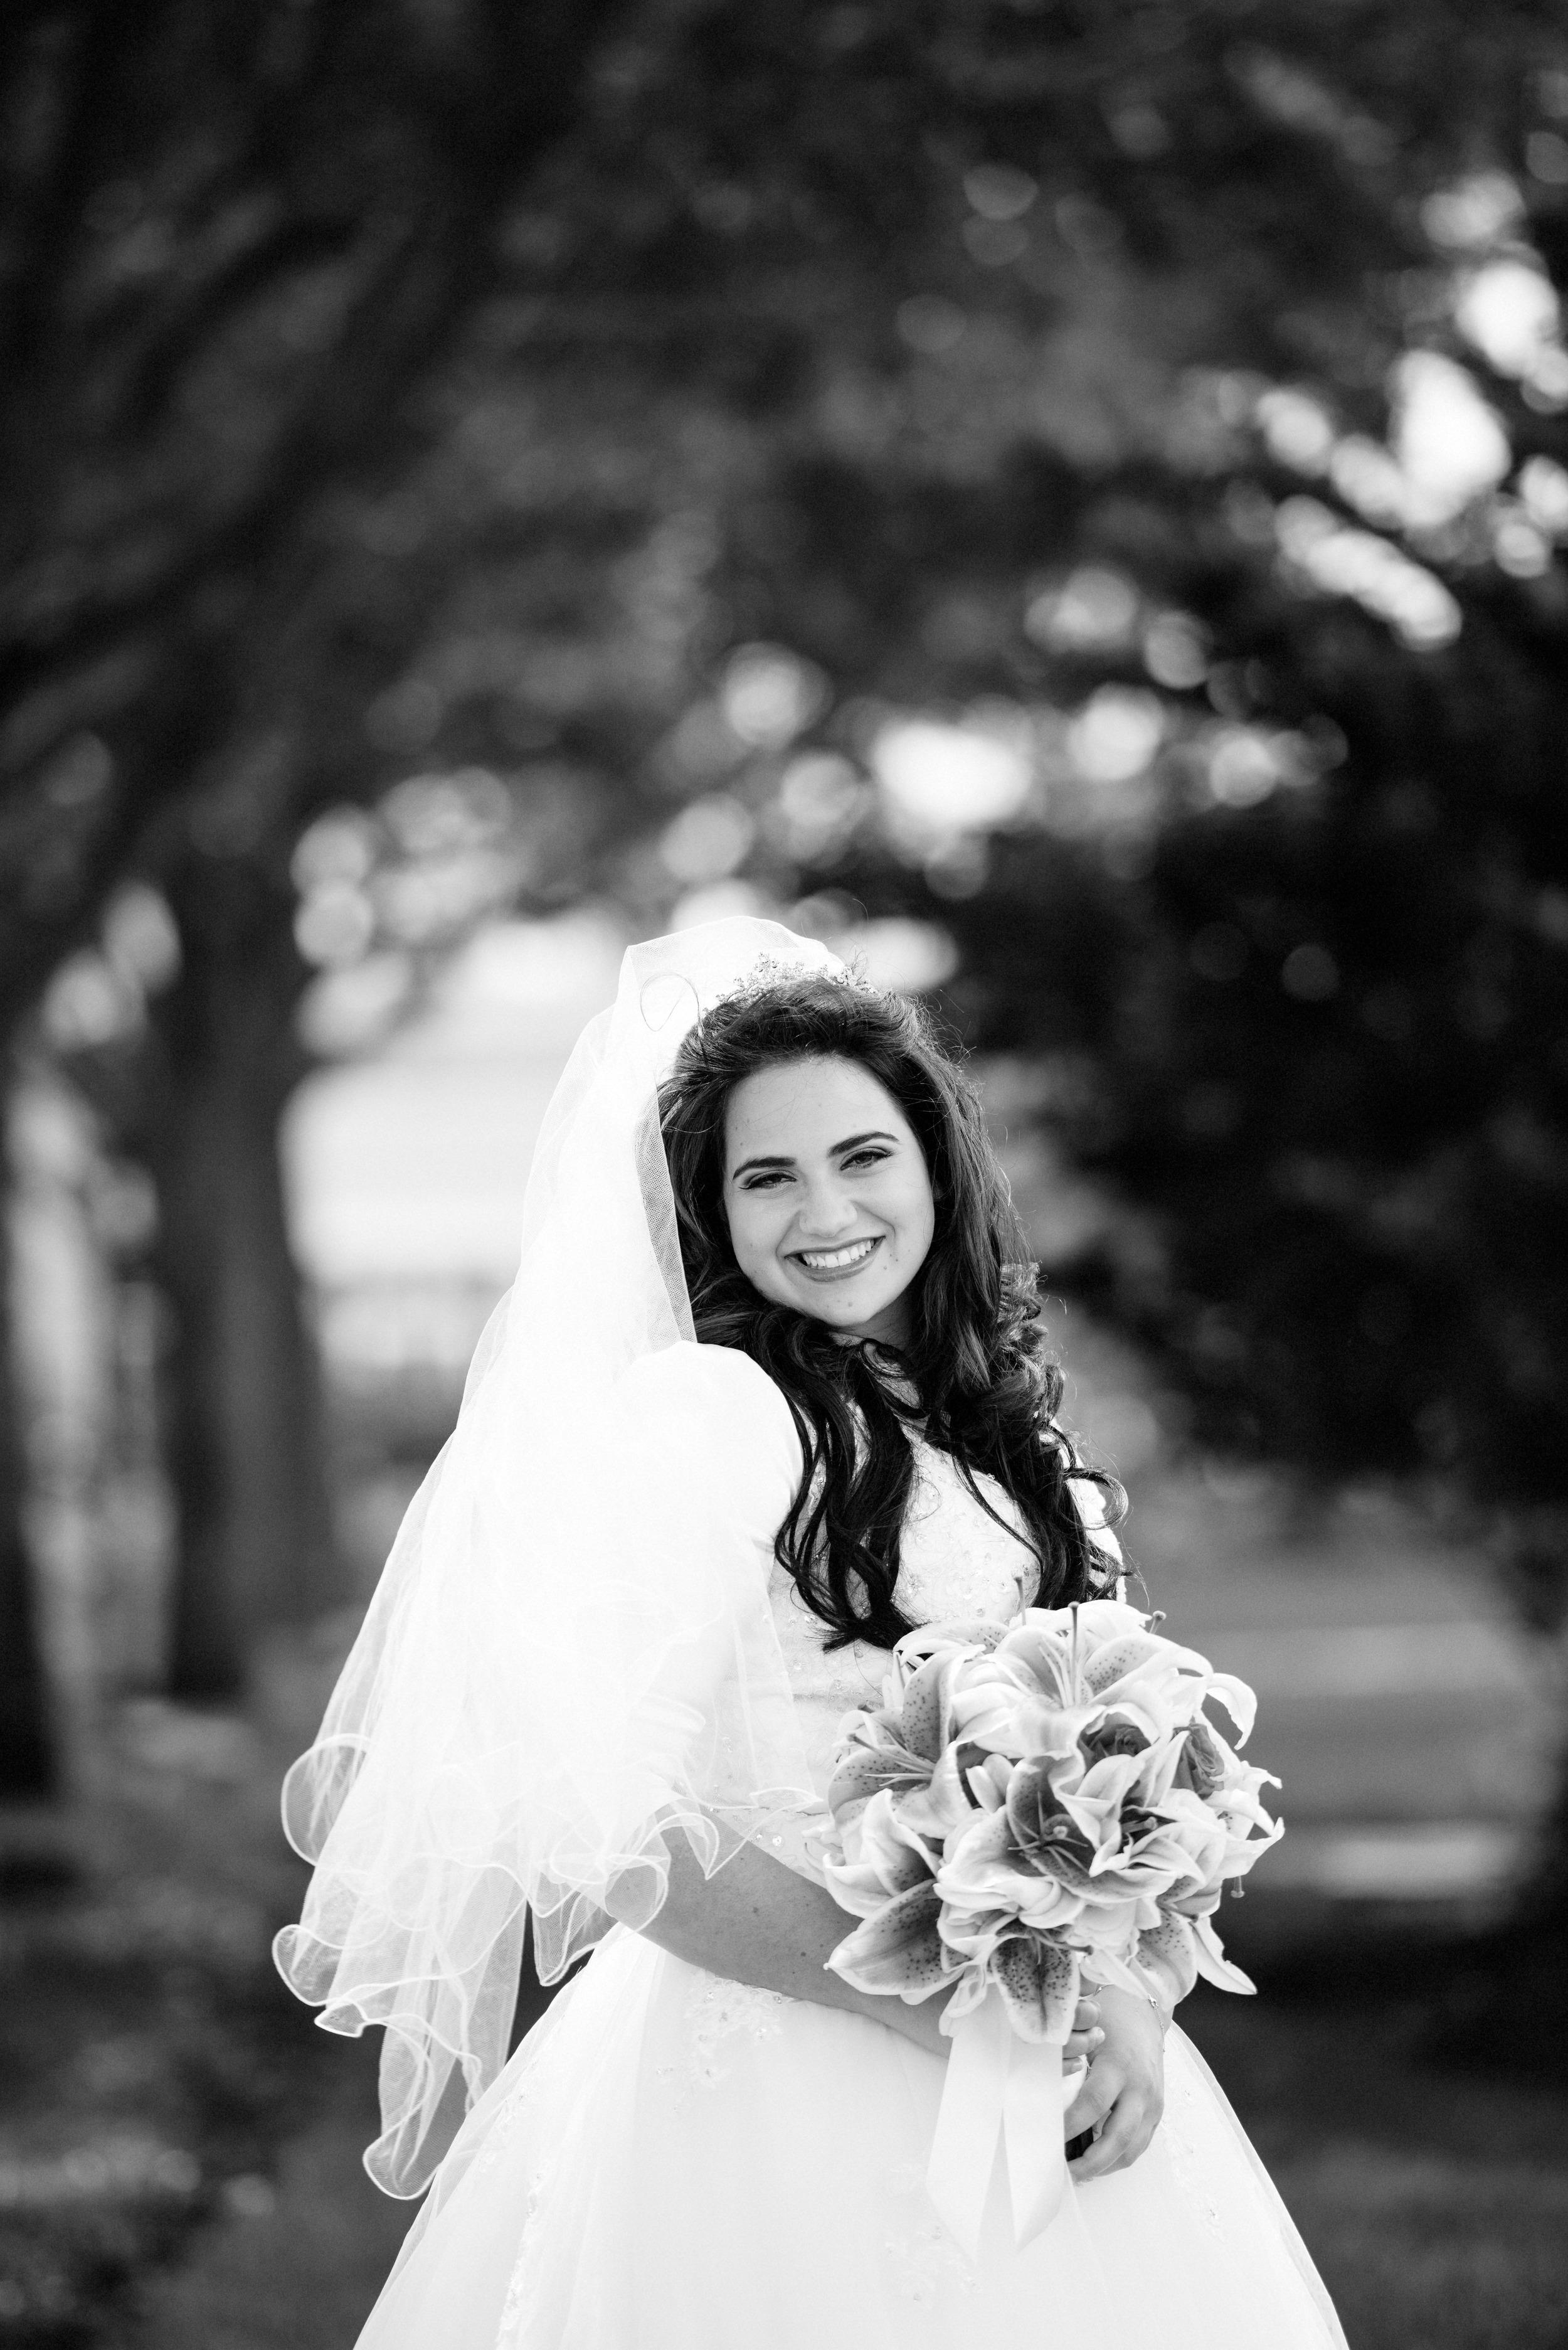 Wedding by Levikfoto.com-050.jpg